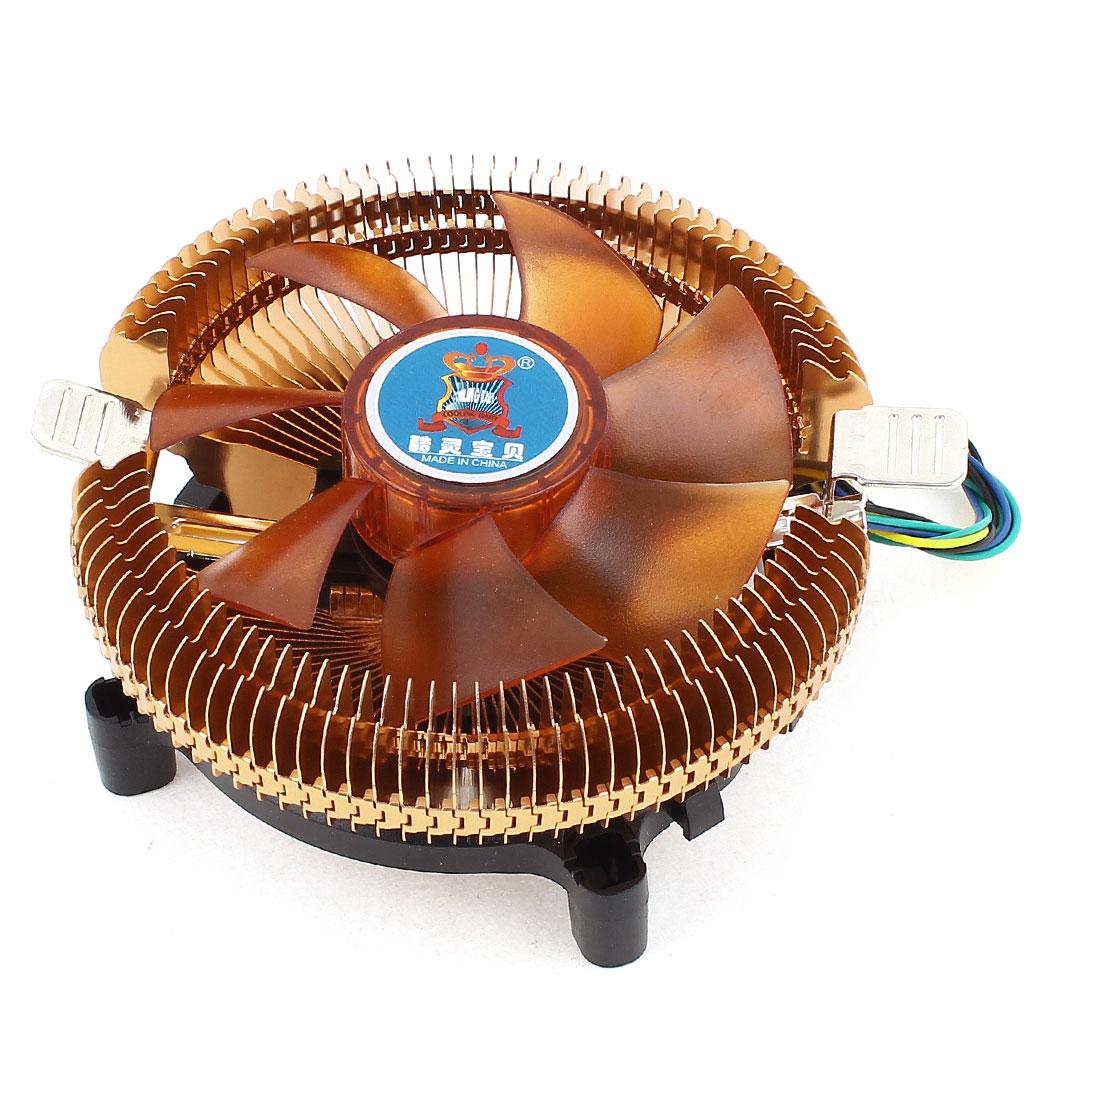 Desktop PC Cooling Fan Heatsink CPU Cooler DC 12V 4Pin for Intel LGA 775 AMD AM2 AM3